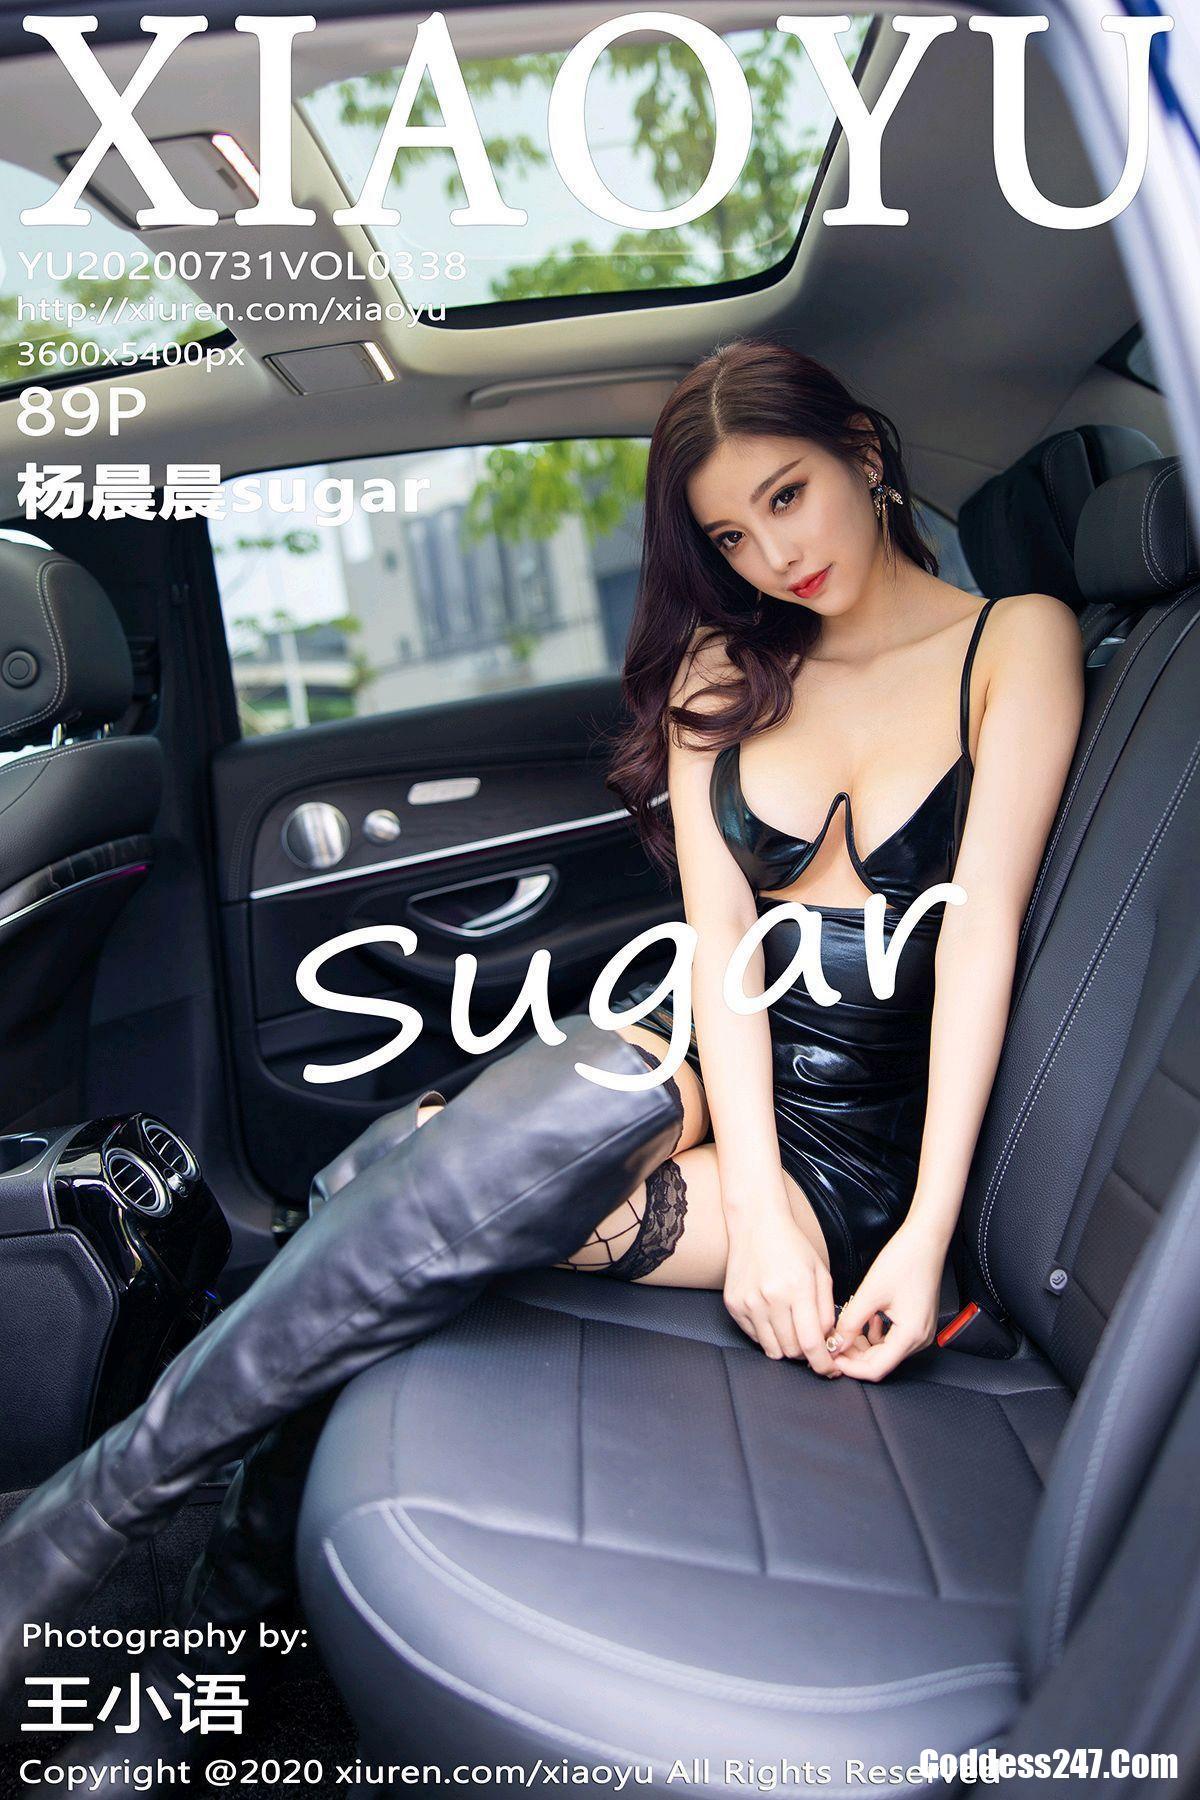 XiaoYu Vol.338 杨晨晨sugar